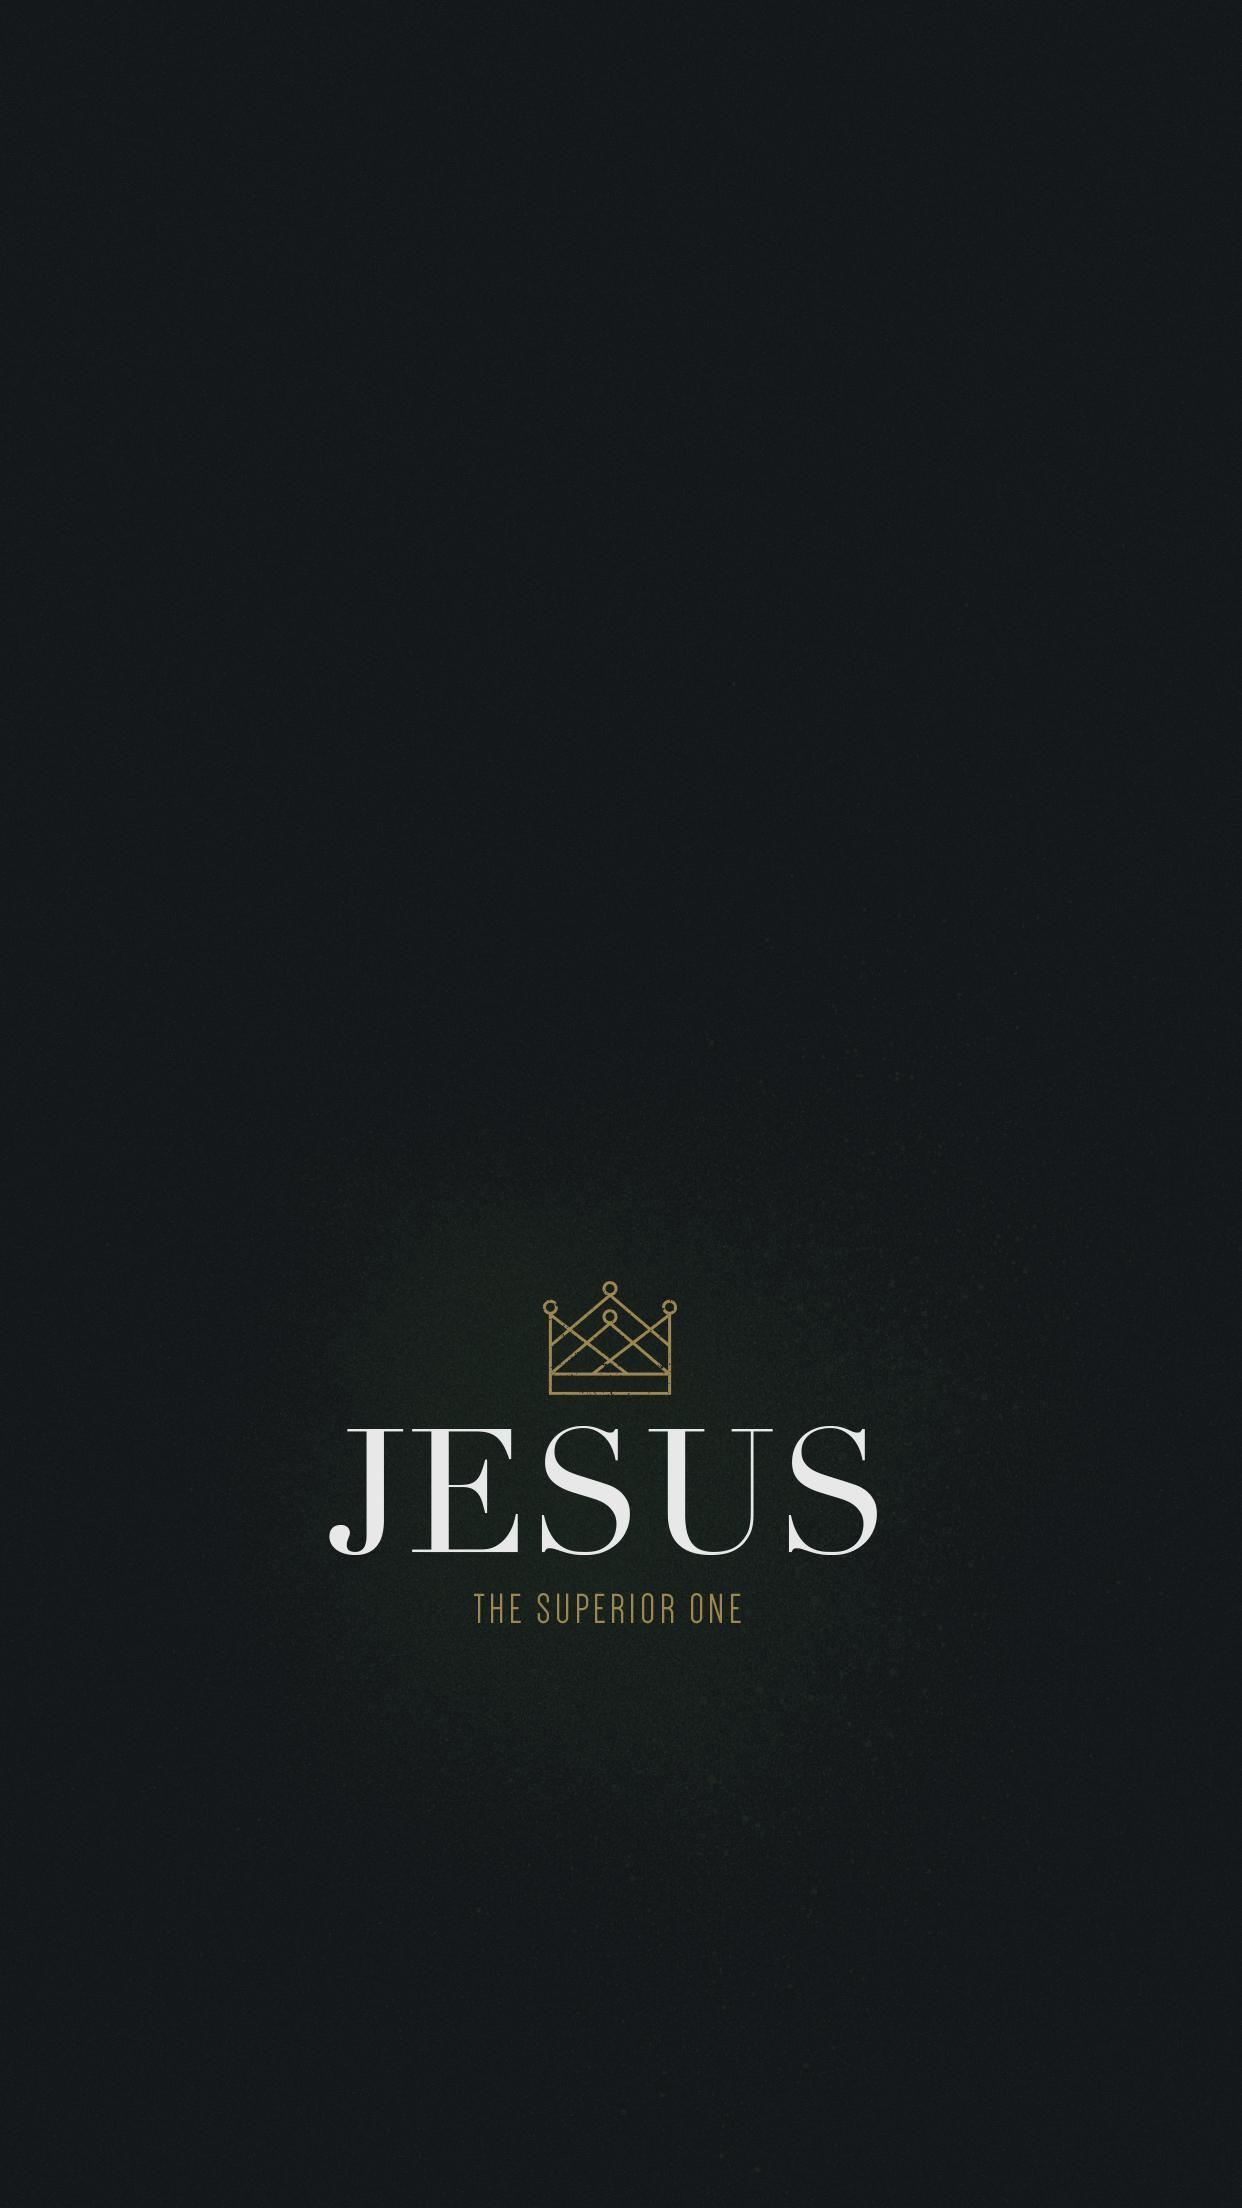 Jesus 4k Mobile Wallpapers - Wallpaper Cave